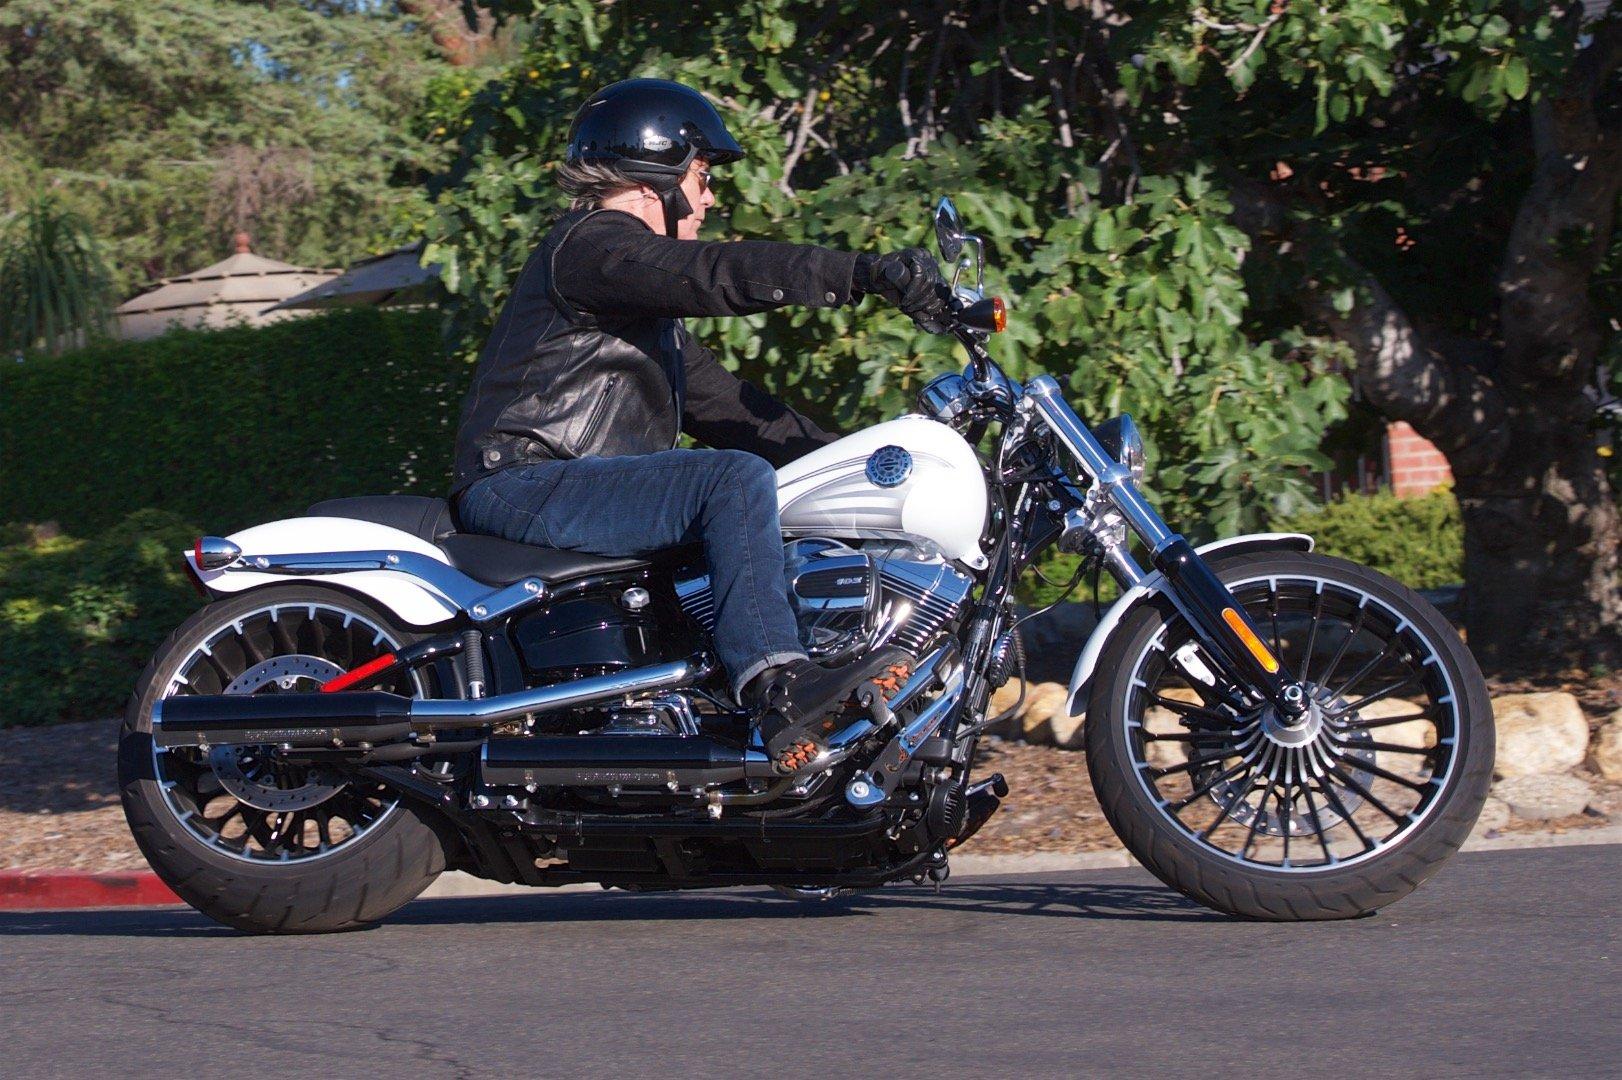 Harley Softail Breakout